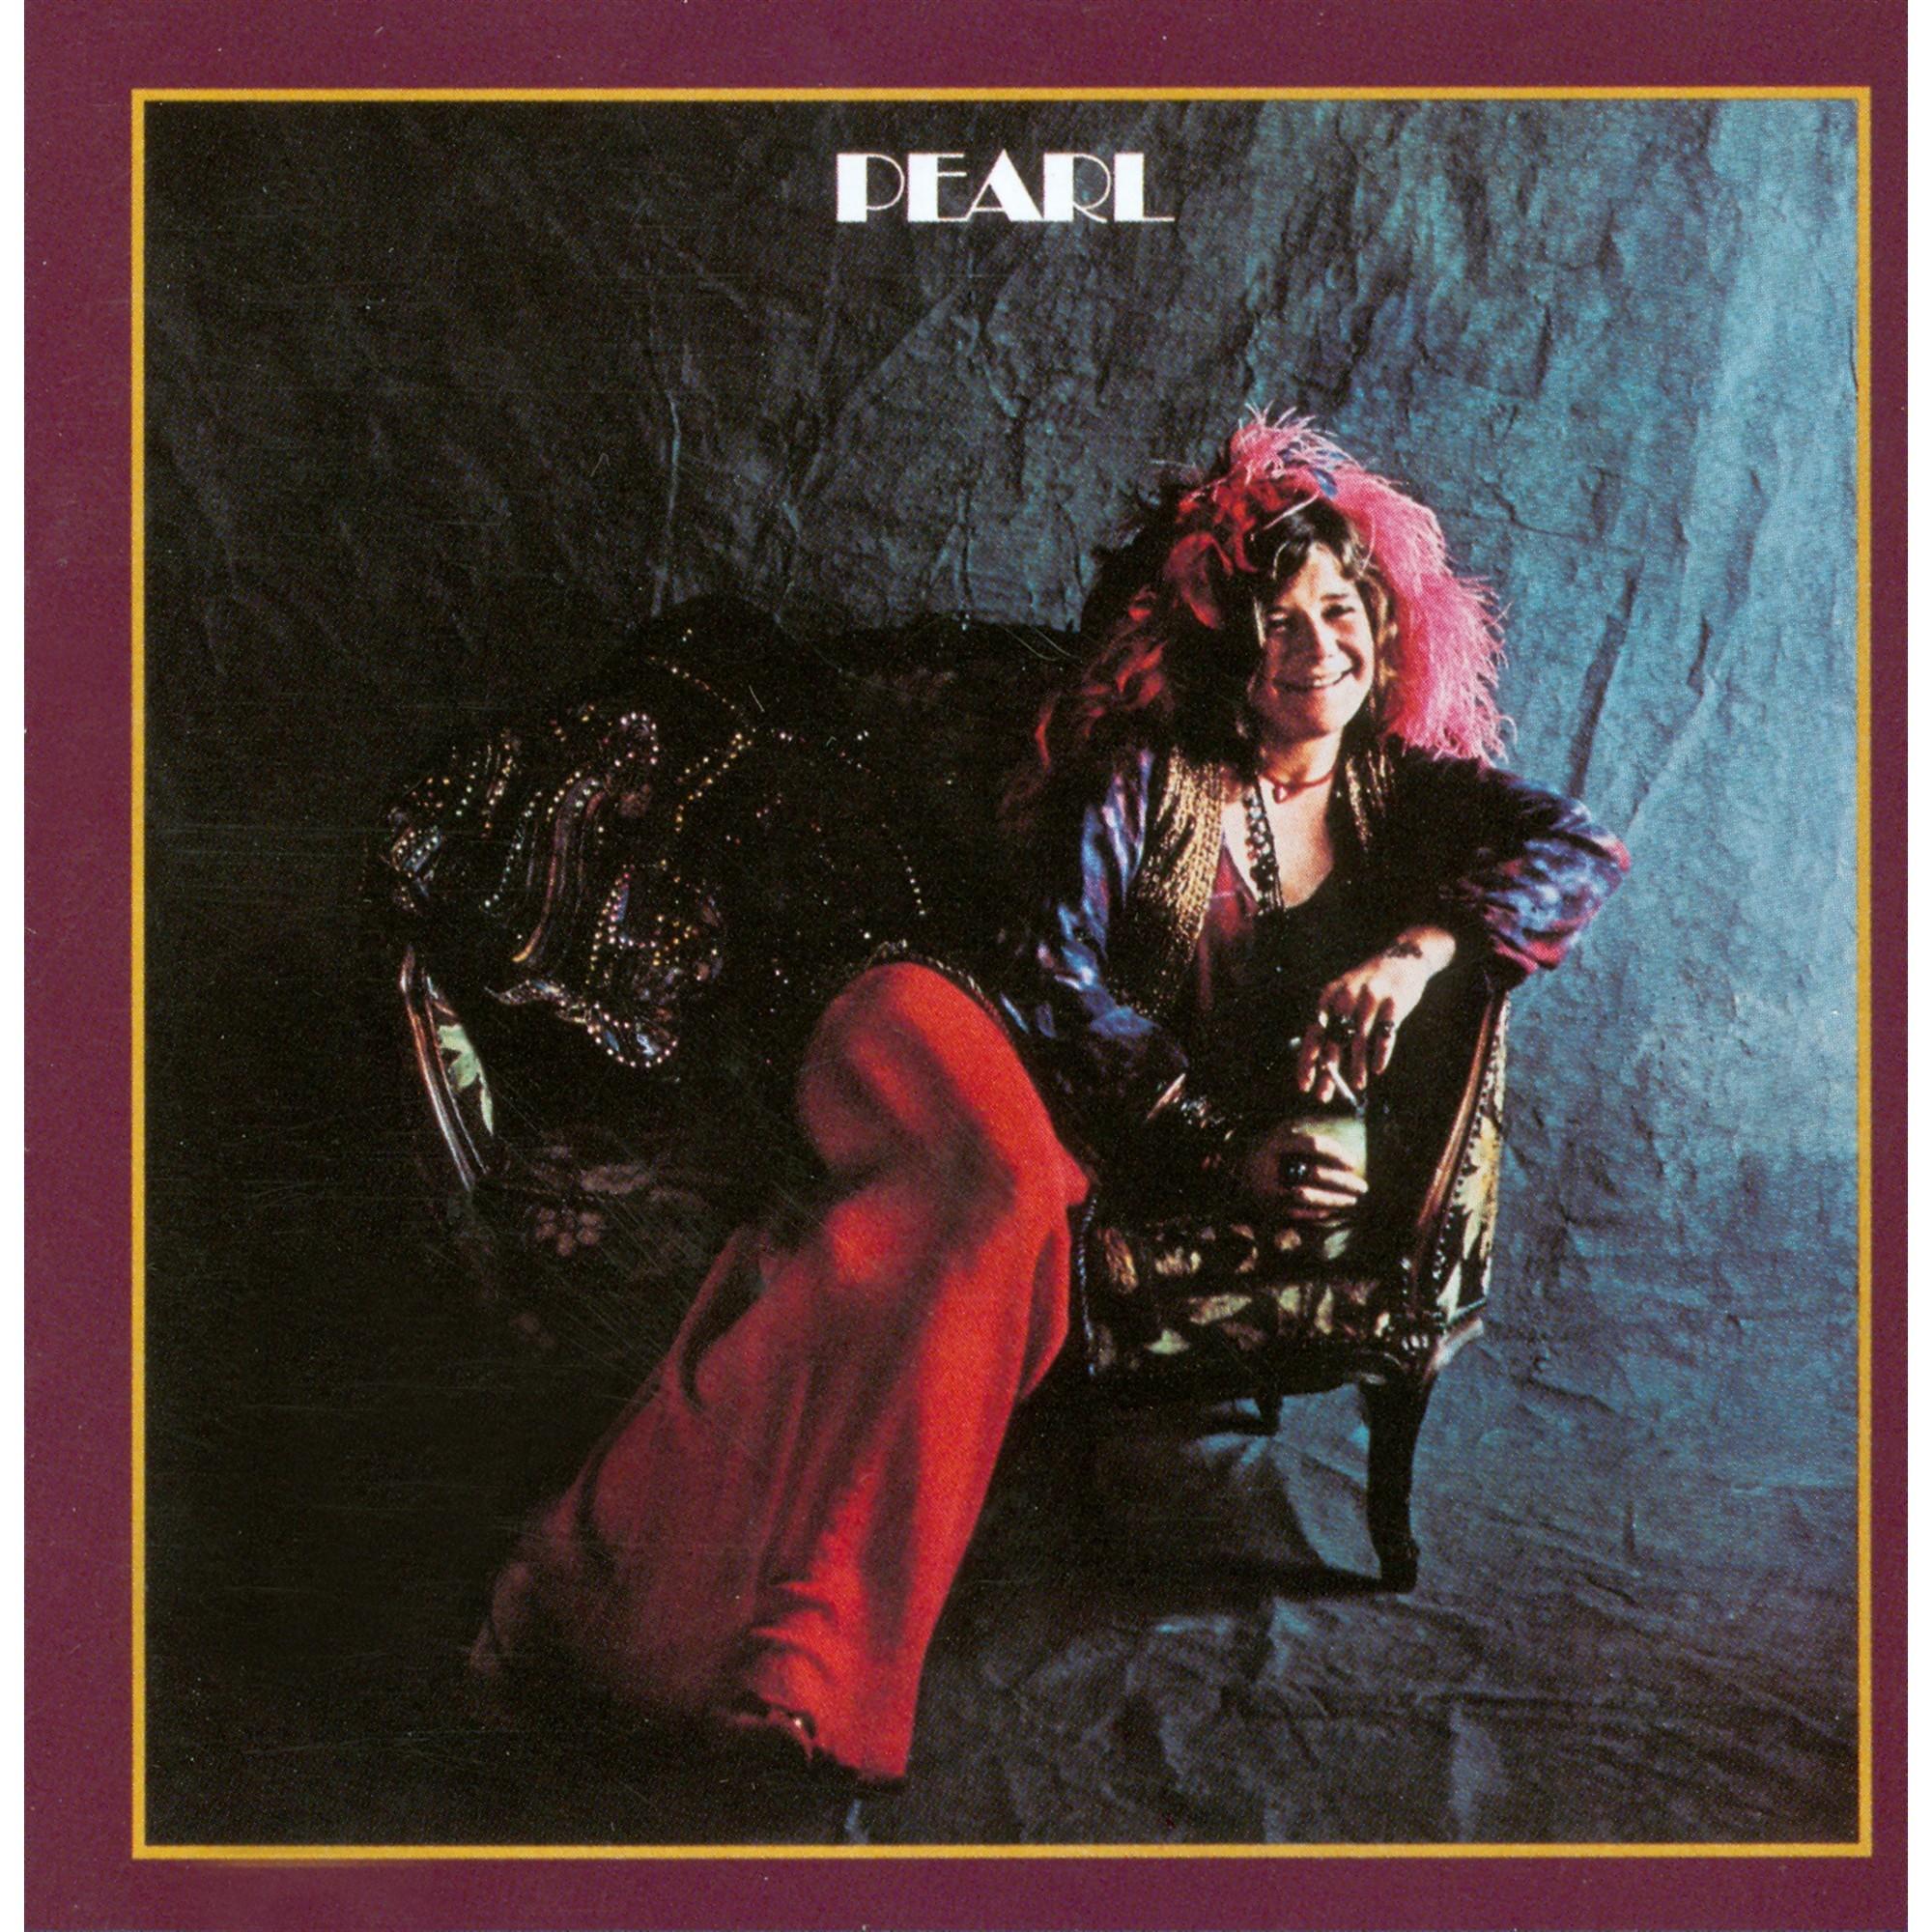 Janis Joplin Pearl Vinyl Rock Album Covers Cool